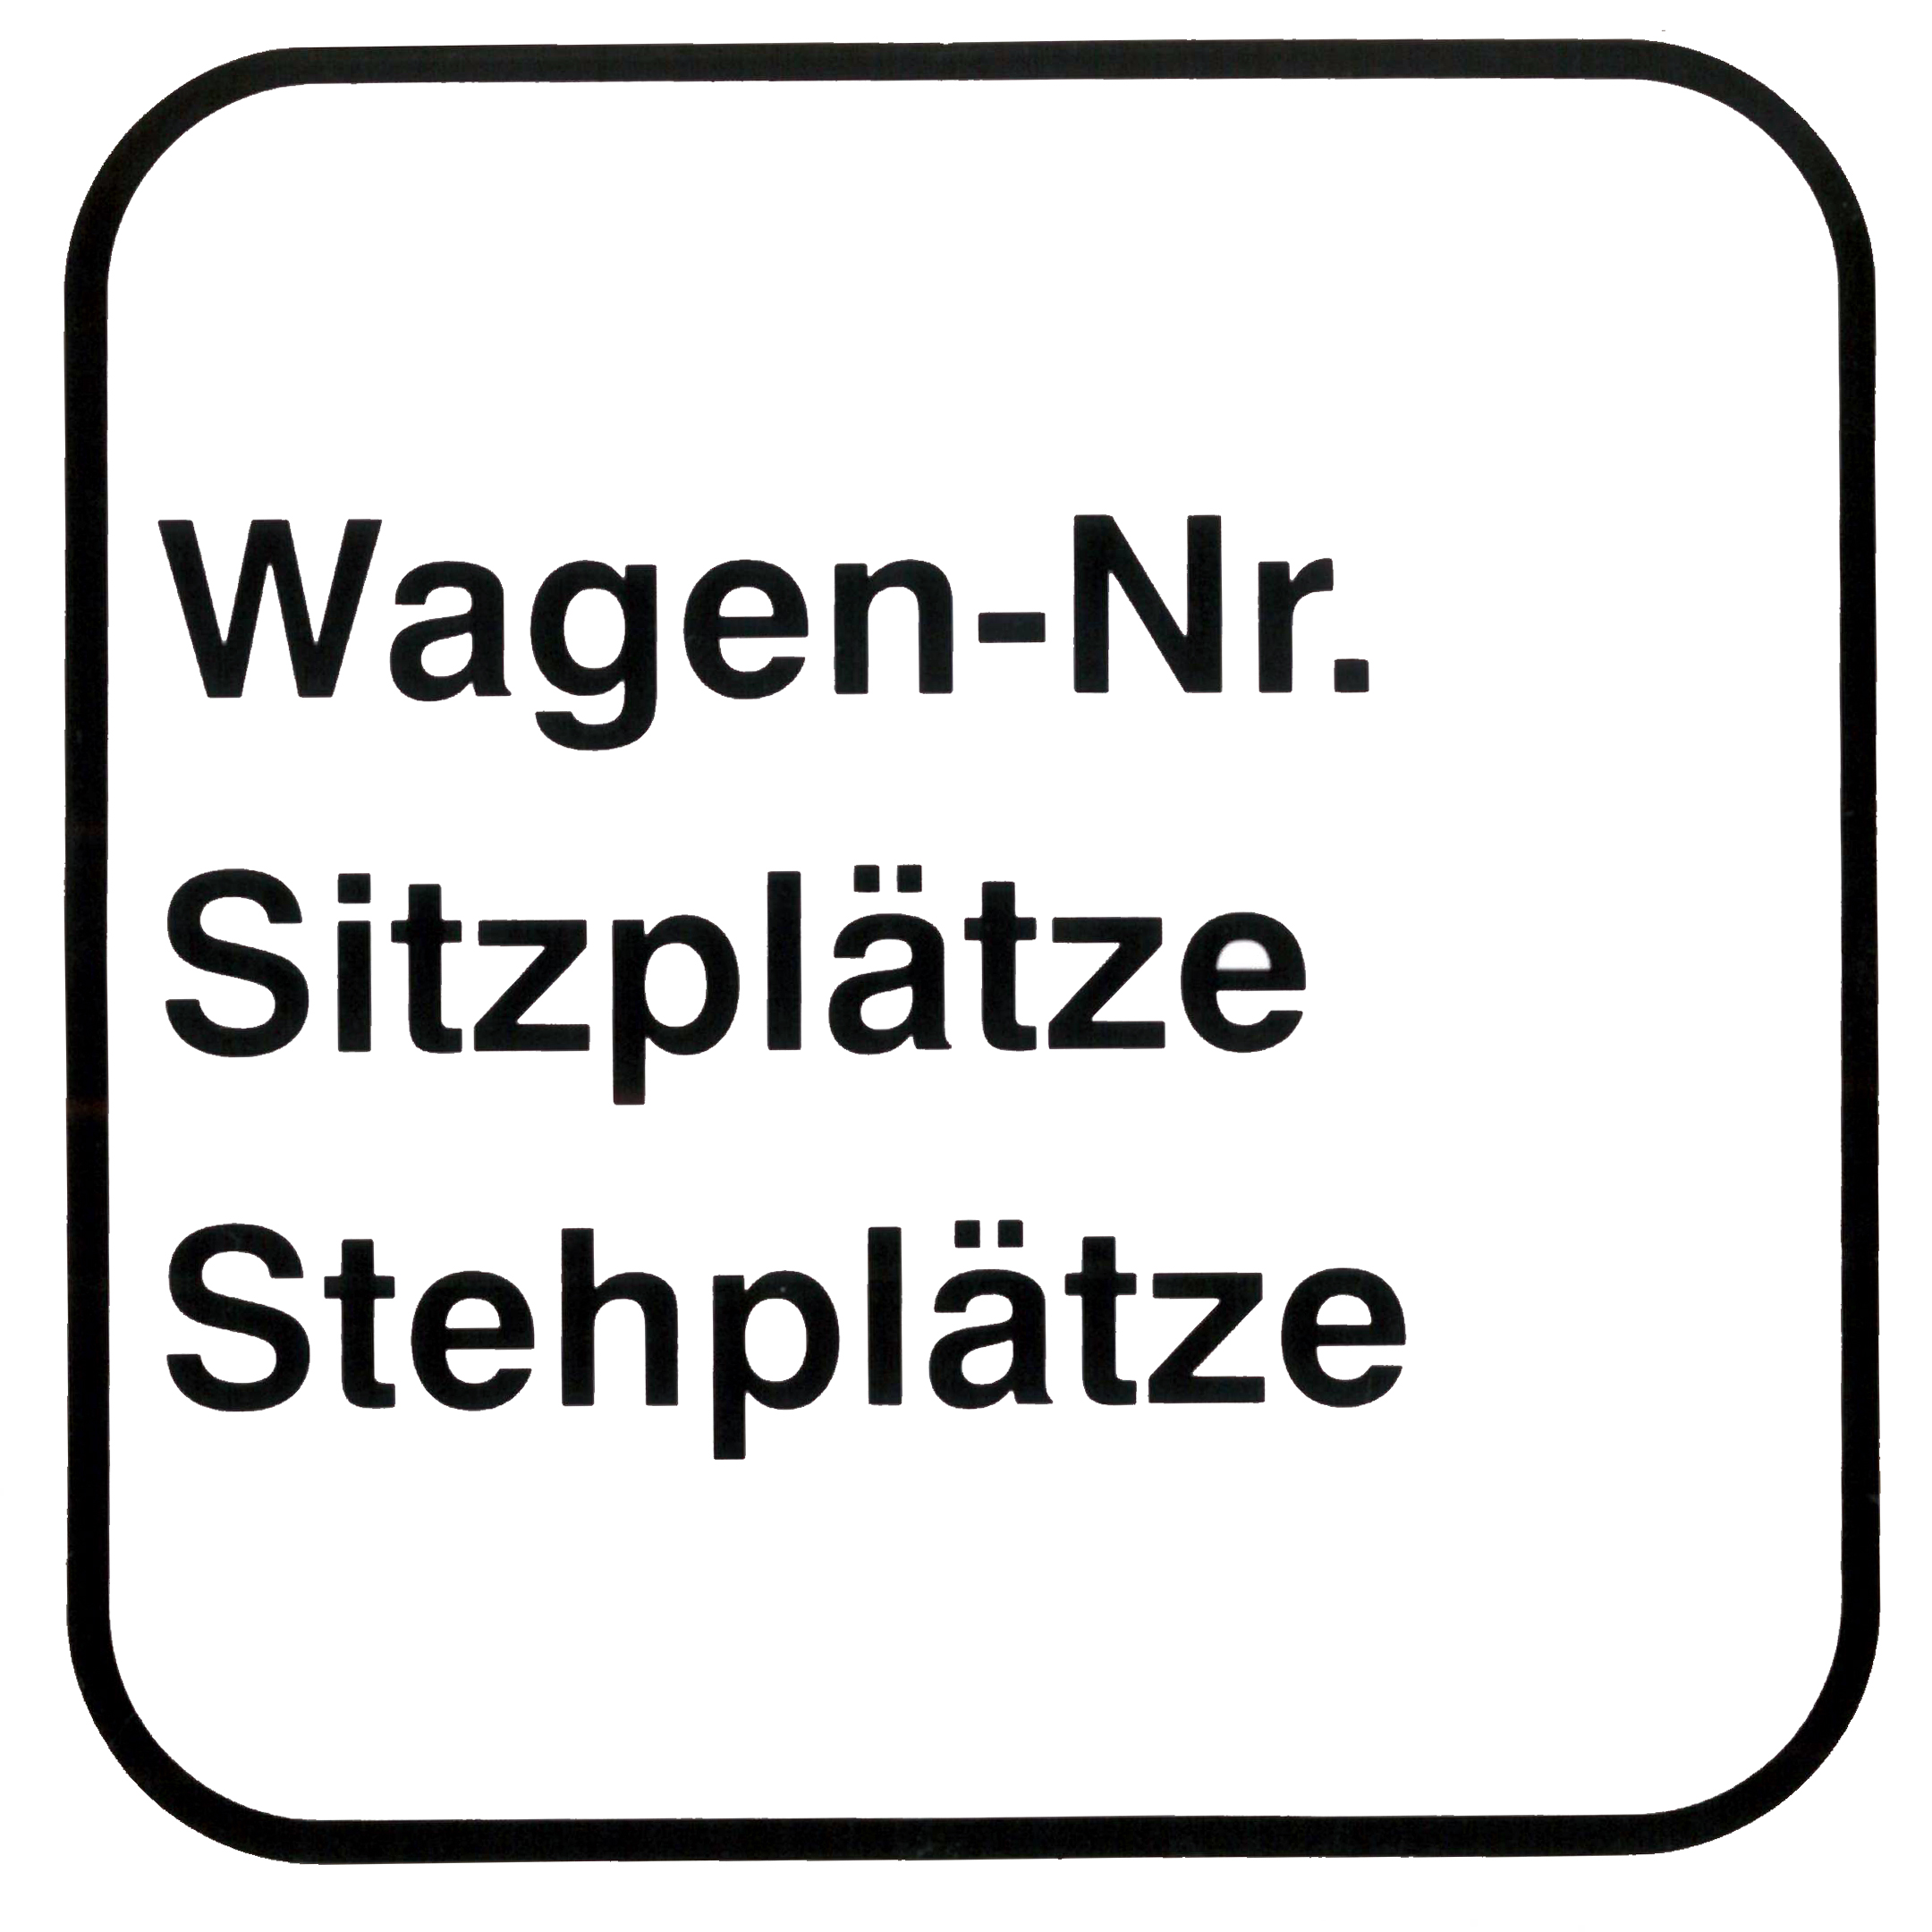 Piktogram V20460: Wagen-Nr / Sitzplätze / Stehplätze